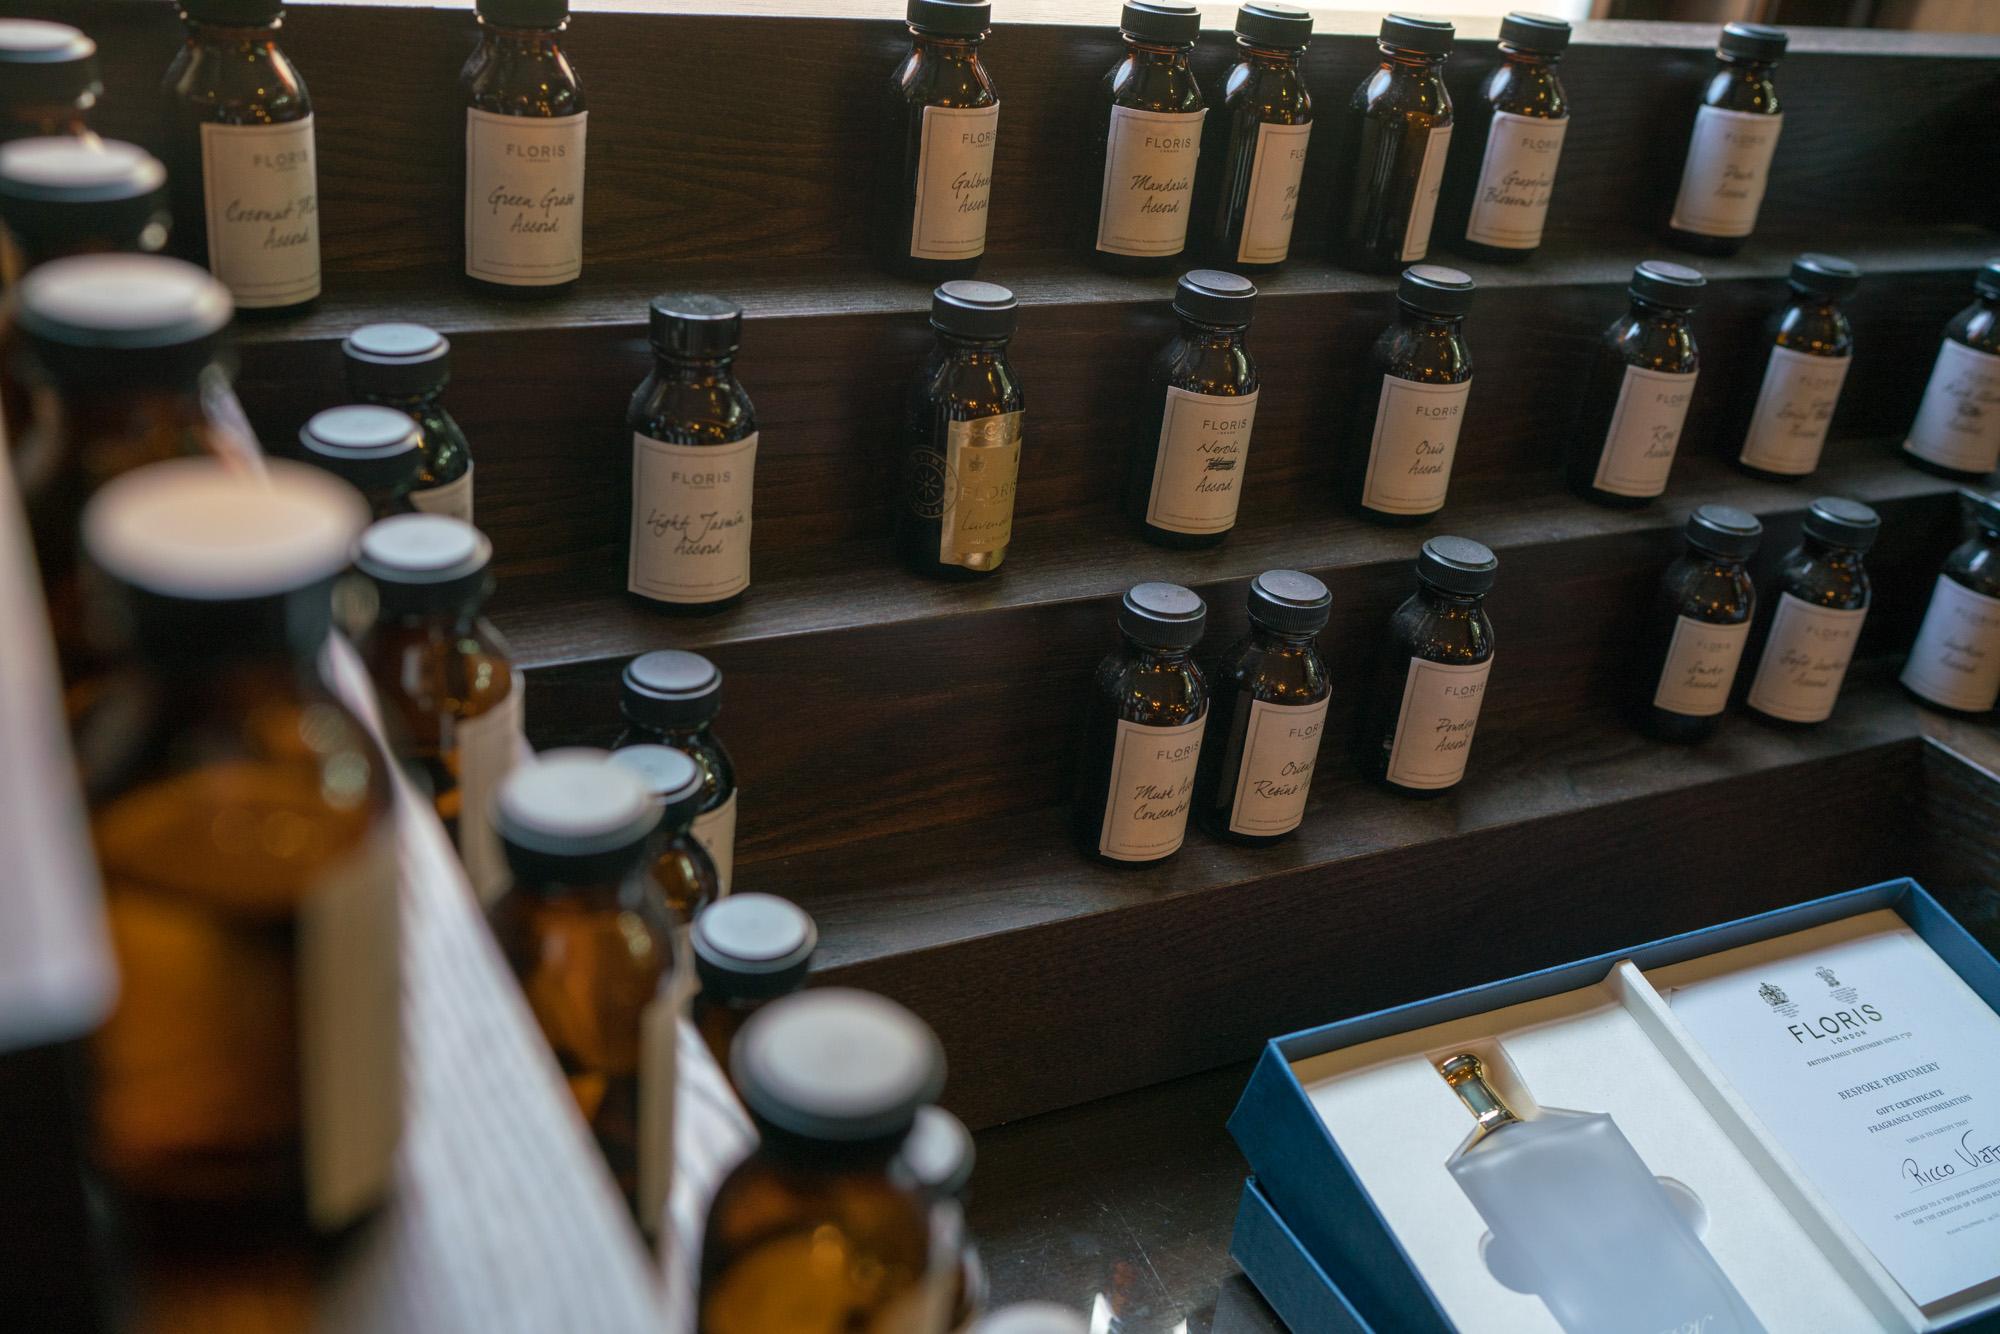 Floris bespoke perfume feature